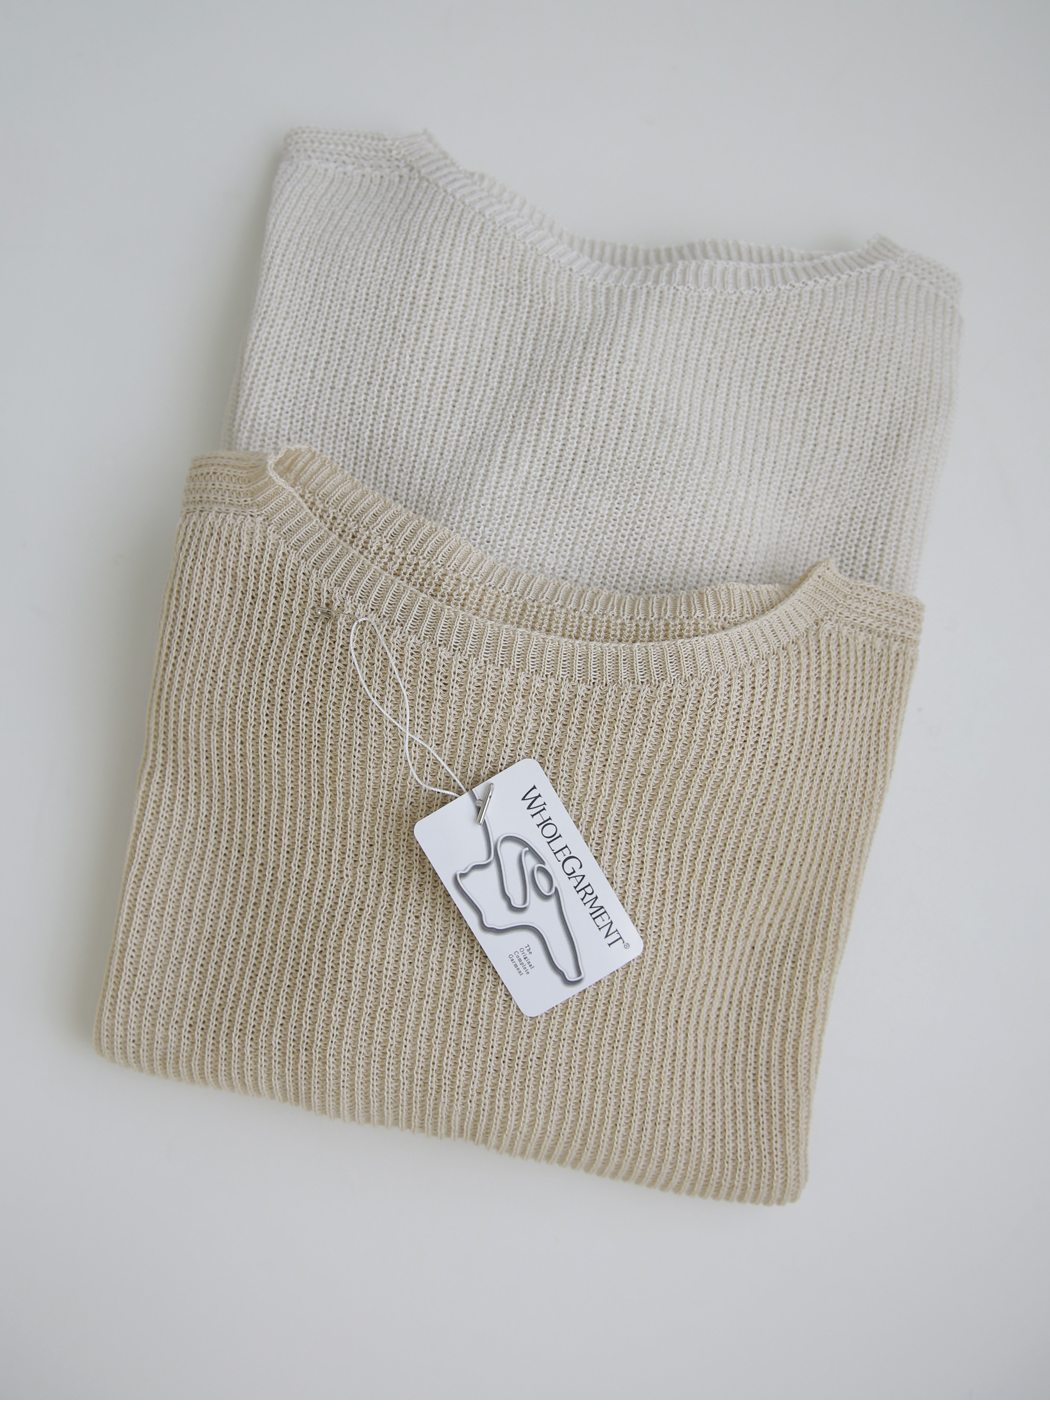 Summer Whole Garment Boat Neck Raglan Knitwear